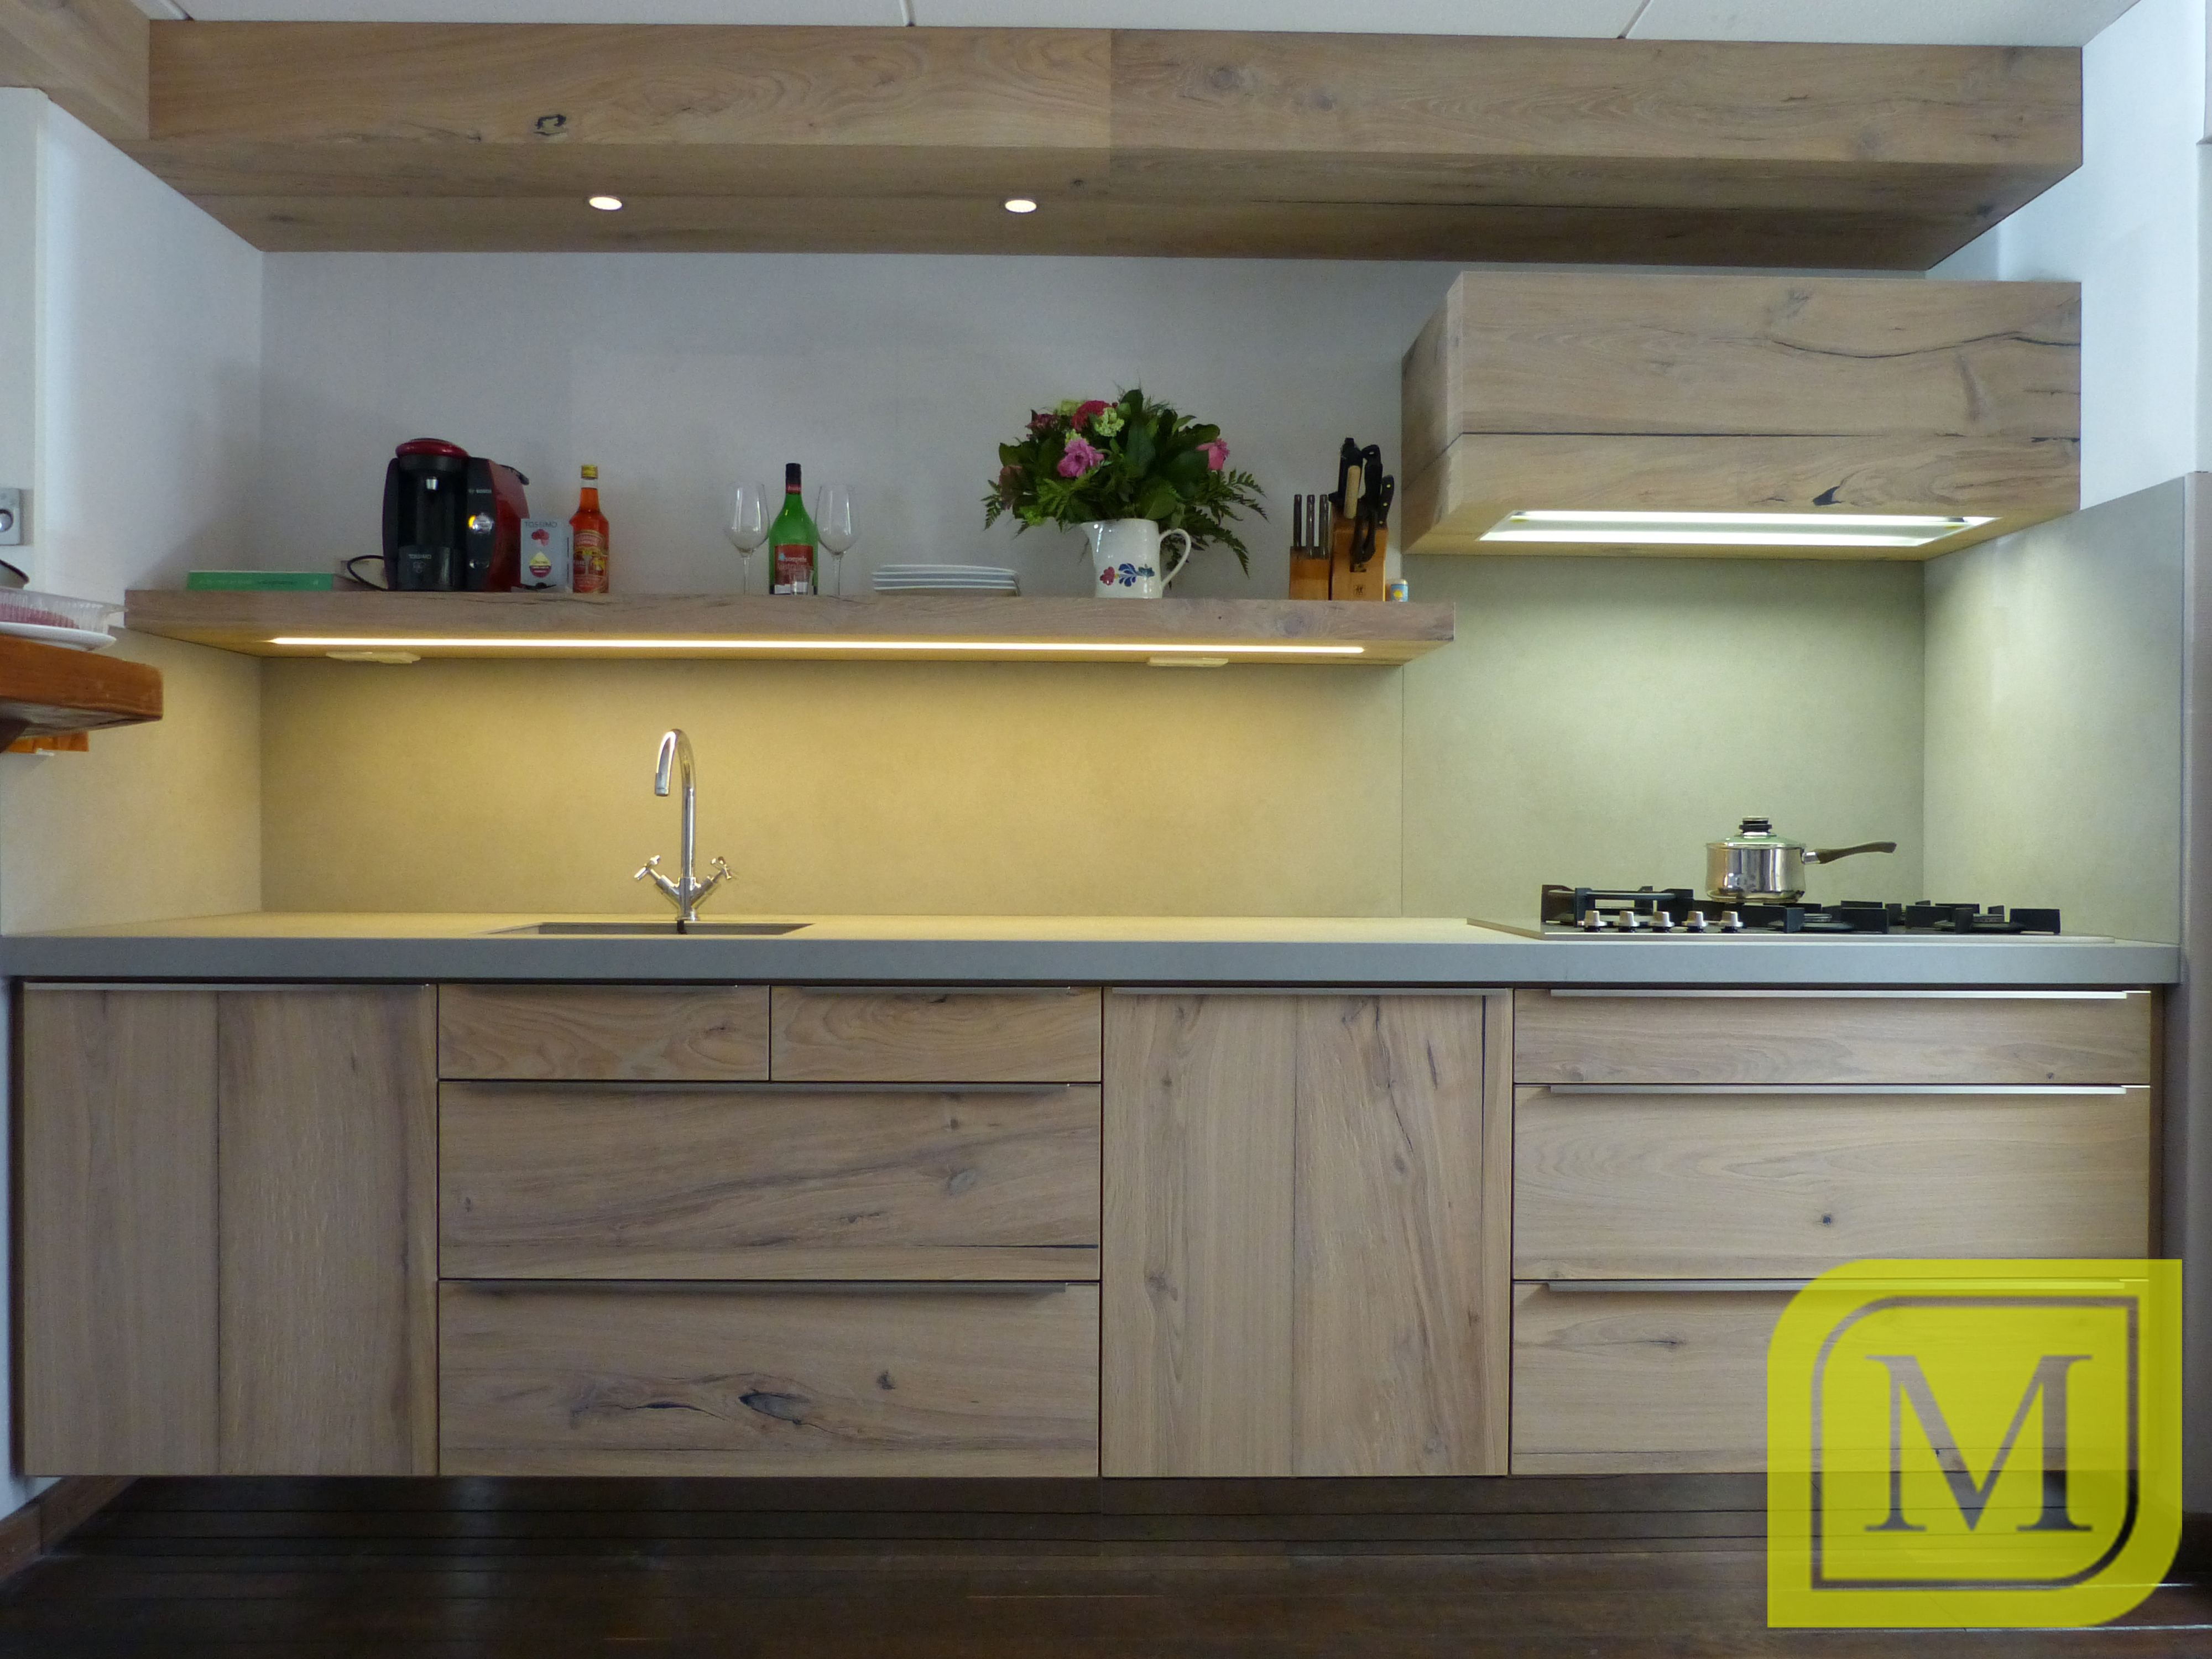 Stoere keuken van eiken balkhout fineer met keramiek for Werkblad keuken keramiek